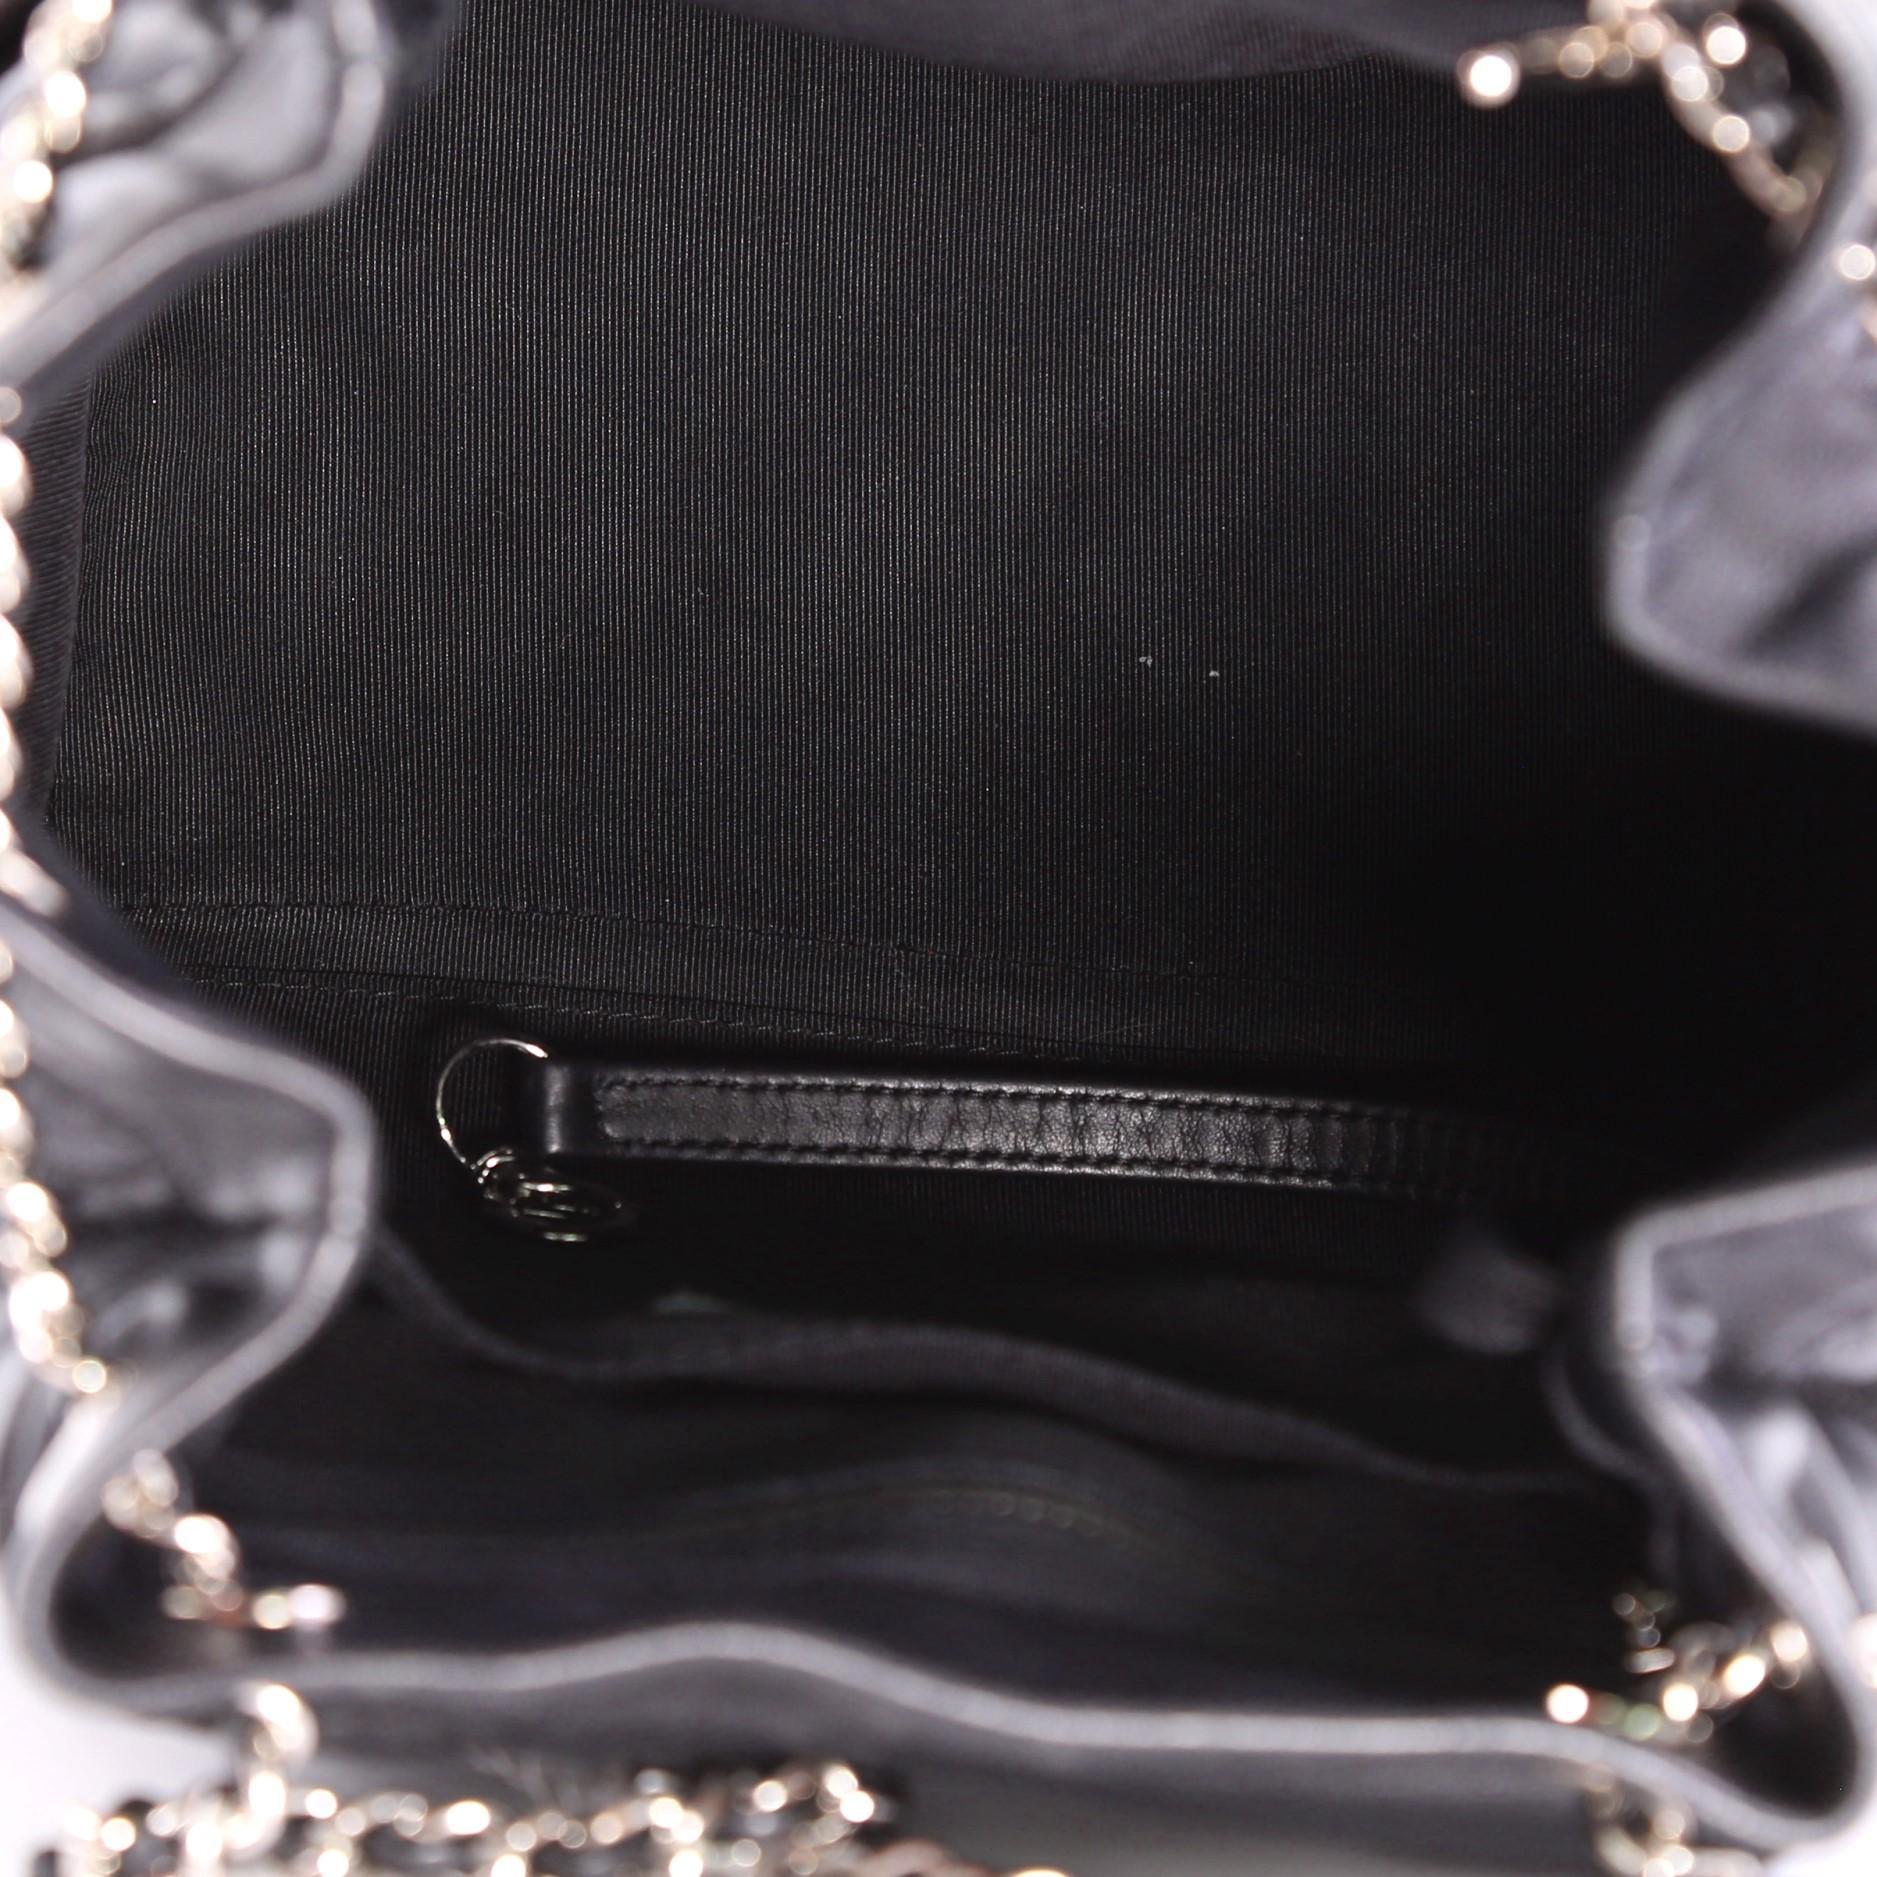 da6d007fac7321 Chanel Urban Spirit Drawstring Bag Chevron Calfskin Small at 1stdibs